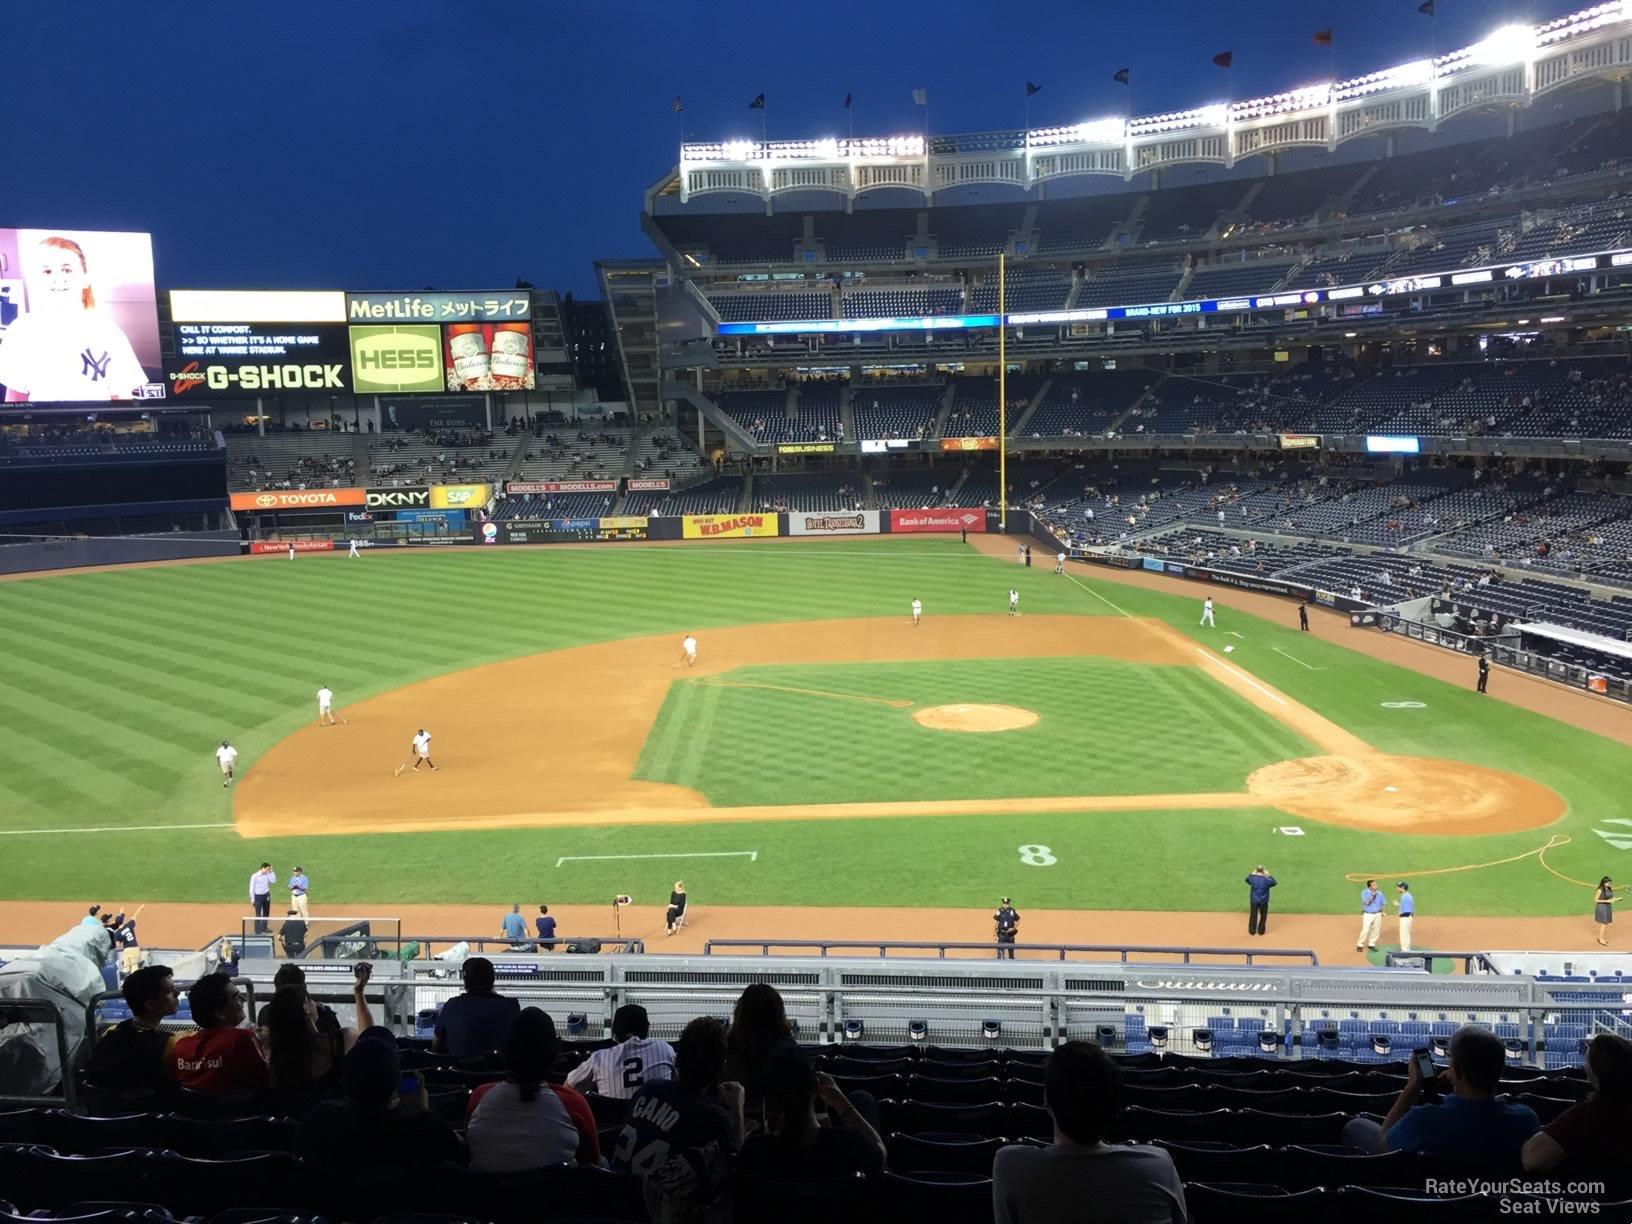 New York Yankees Seat View for Yankee Stadium Section 224